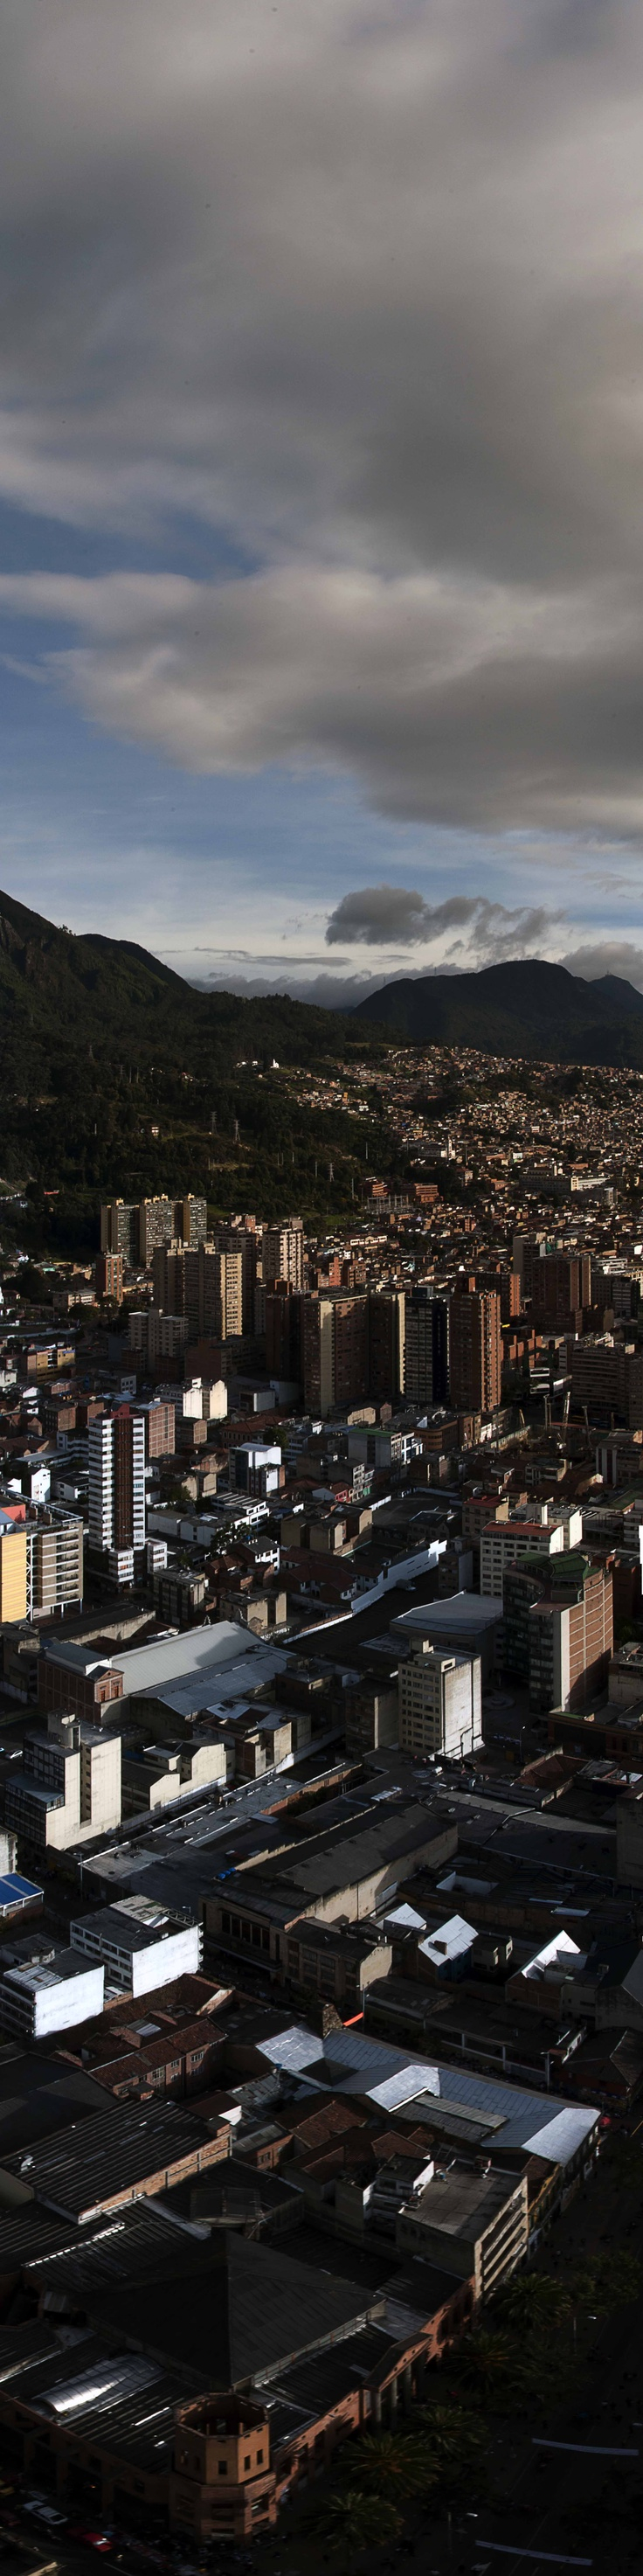 Bogotá - City meets mountains